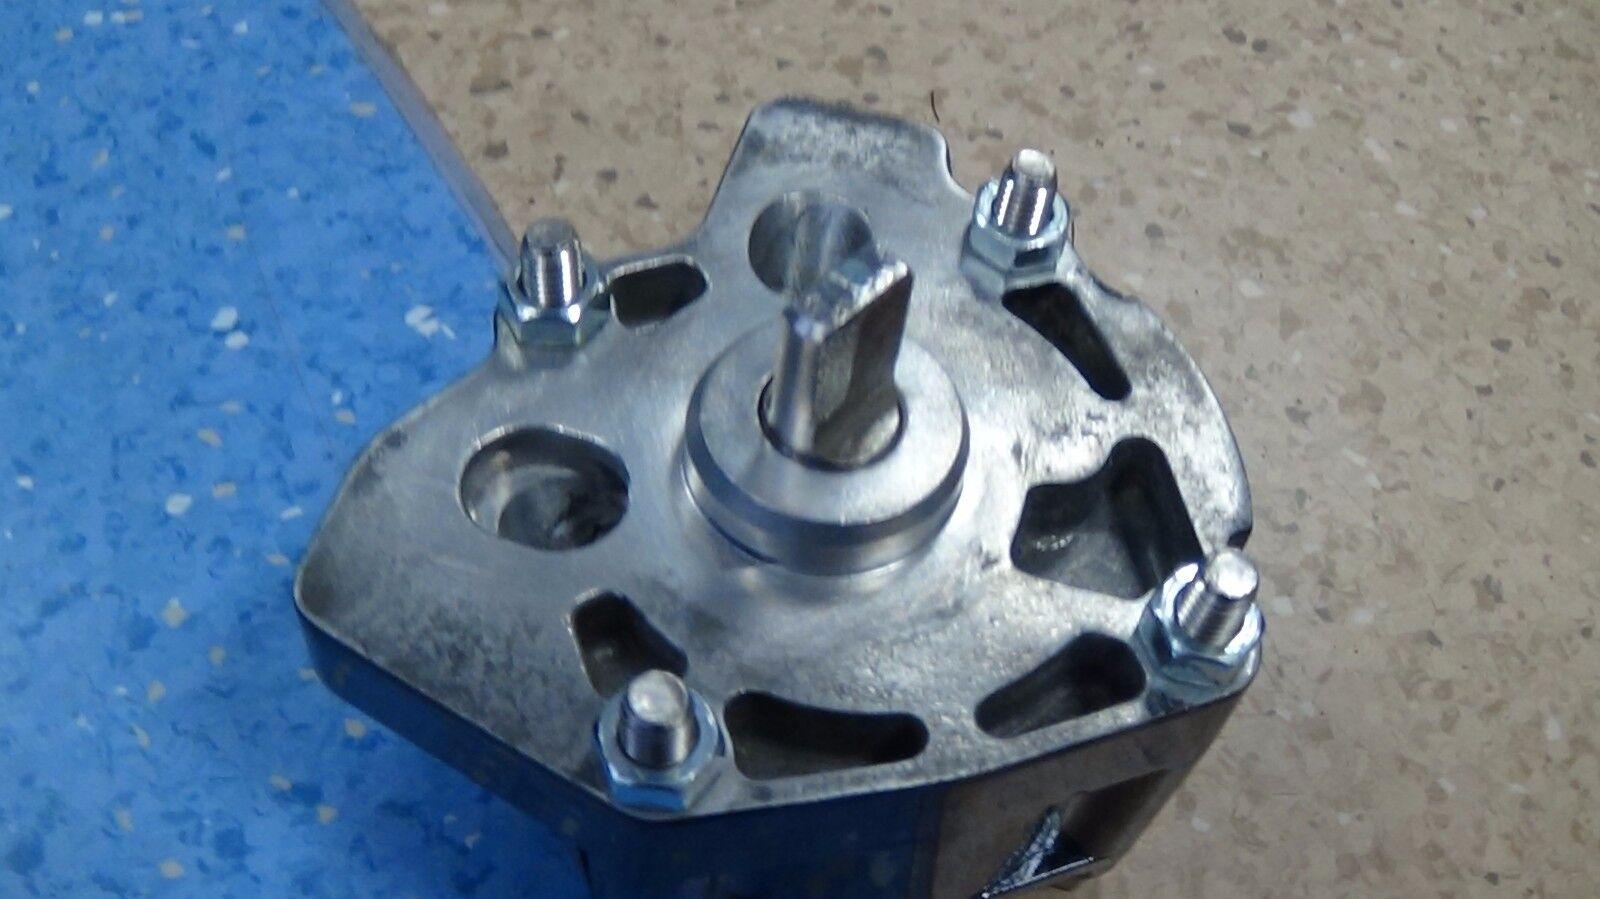 YANMAR Pump Diesel D36 Oil Pump YANMAR Assy 120380-32011 a4819c